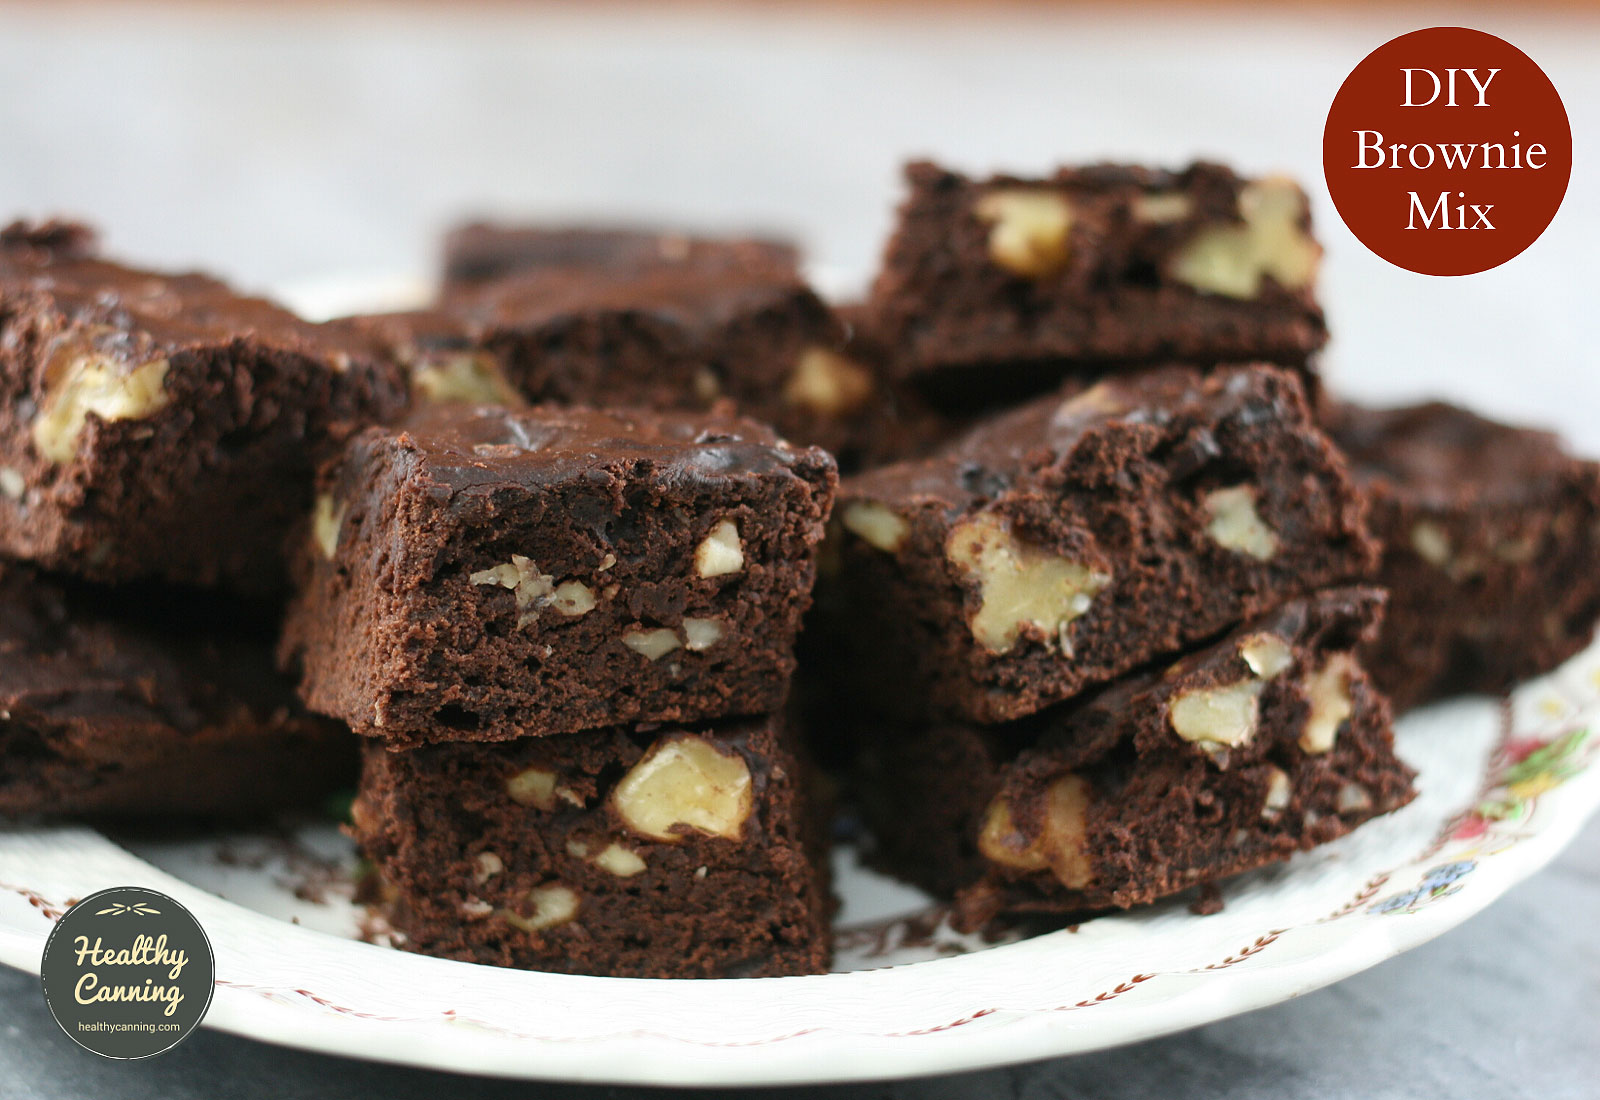 DIY Brownie Mix, made up into brownies